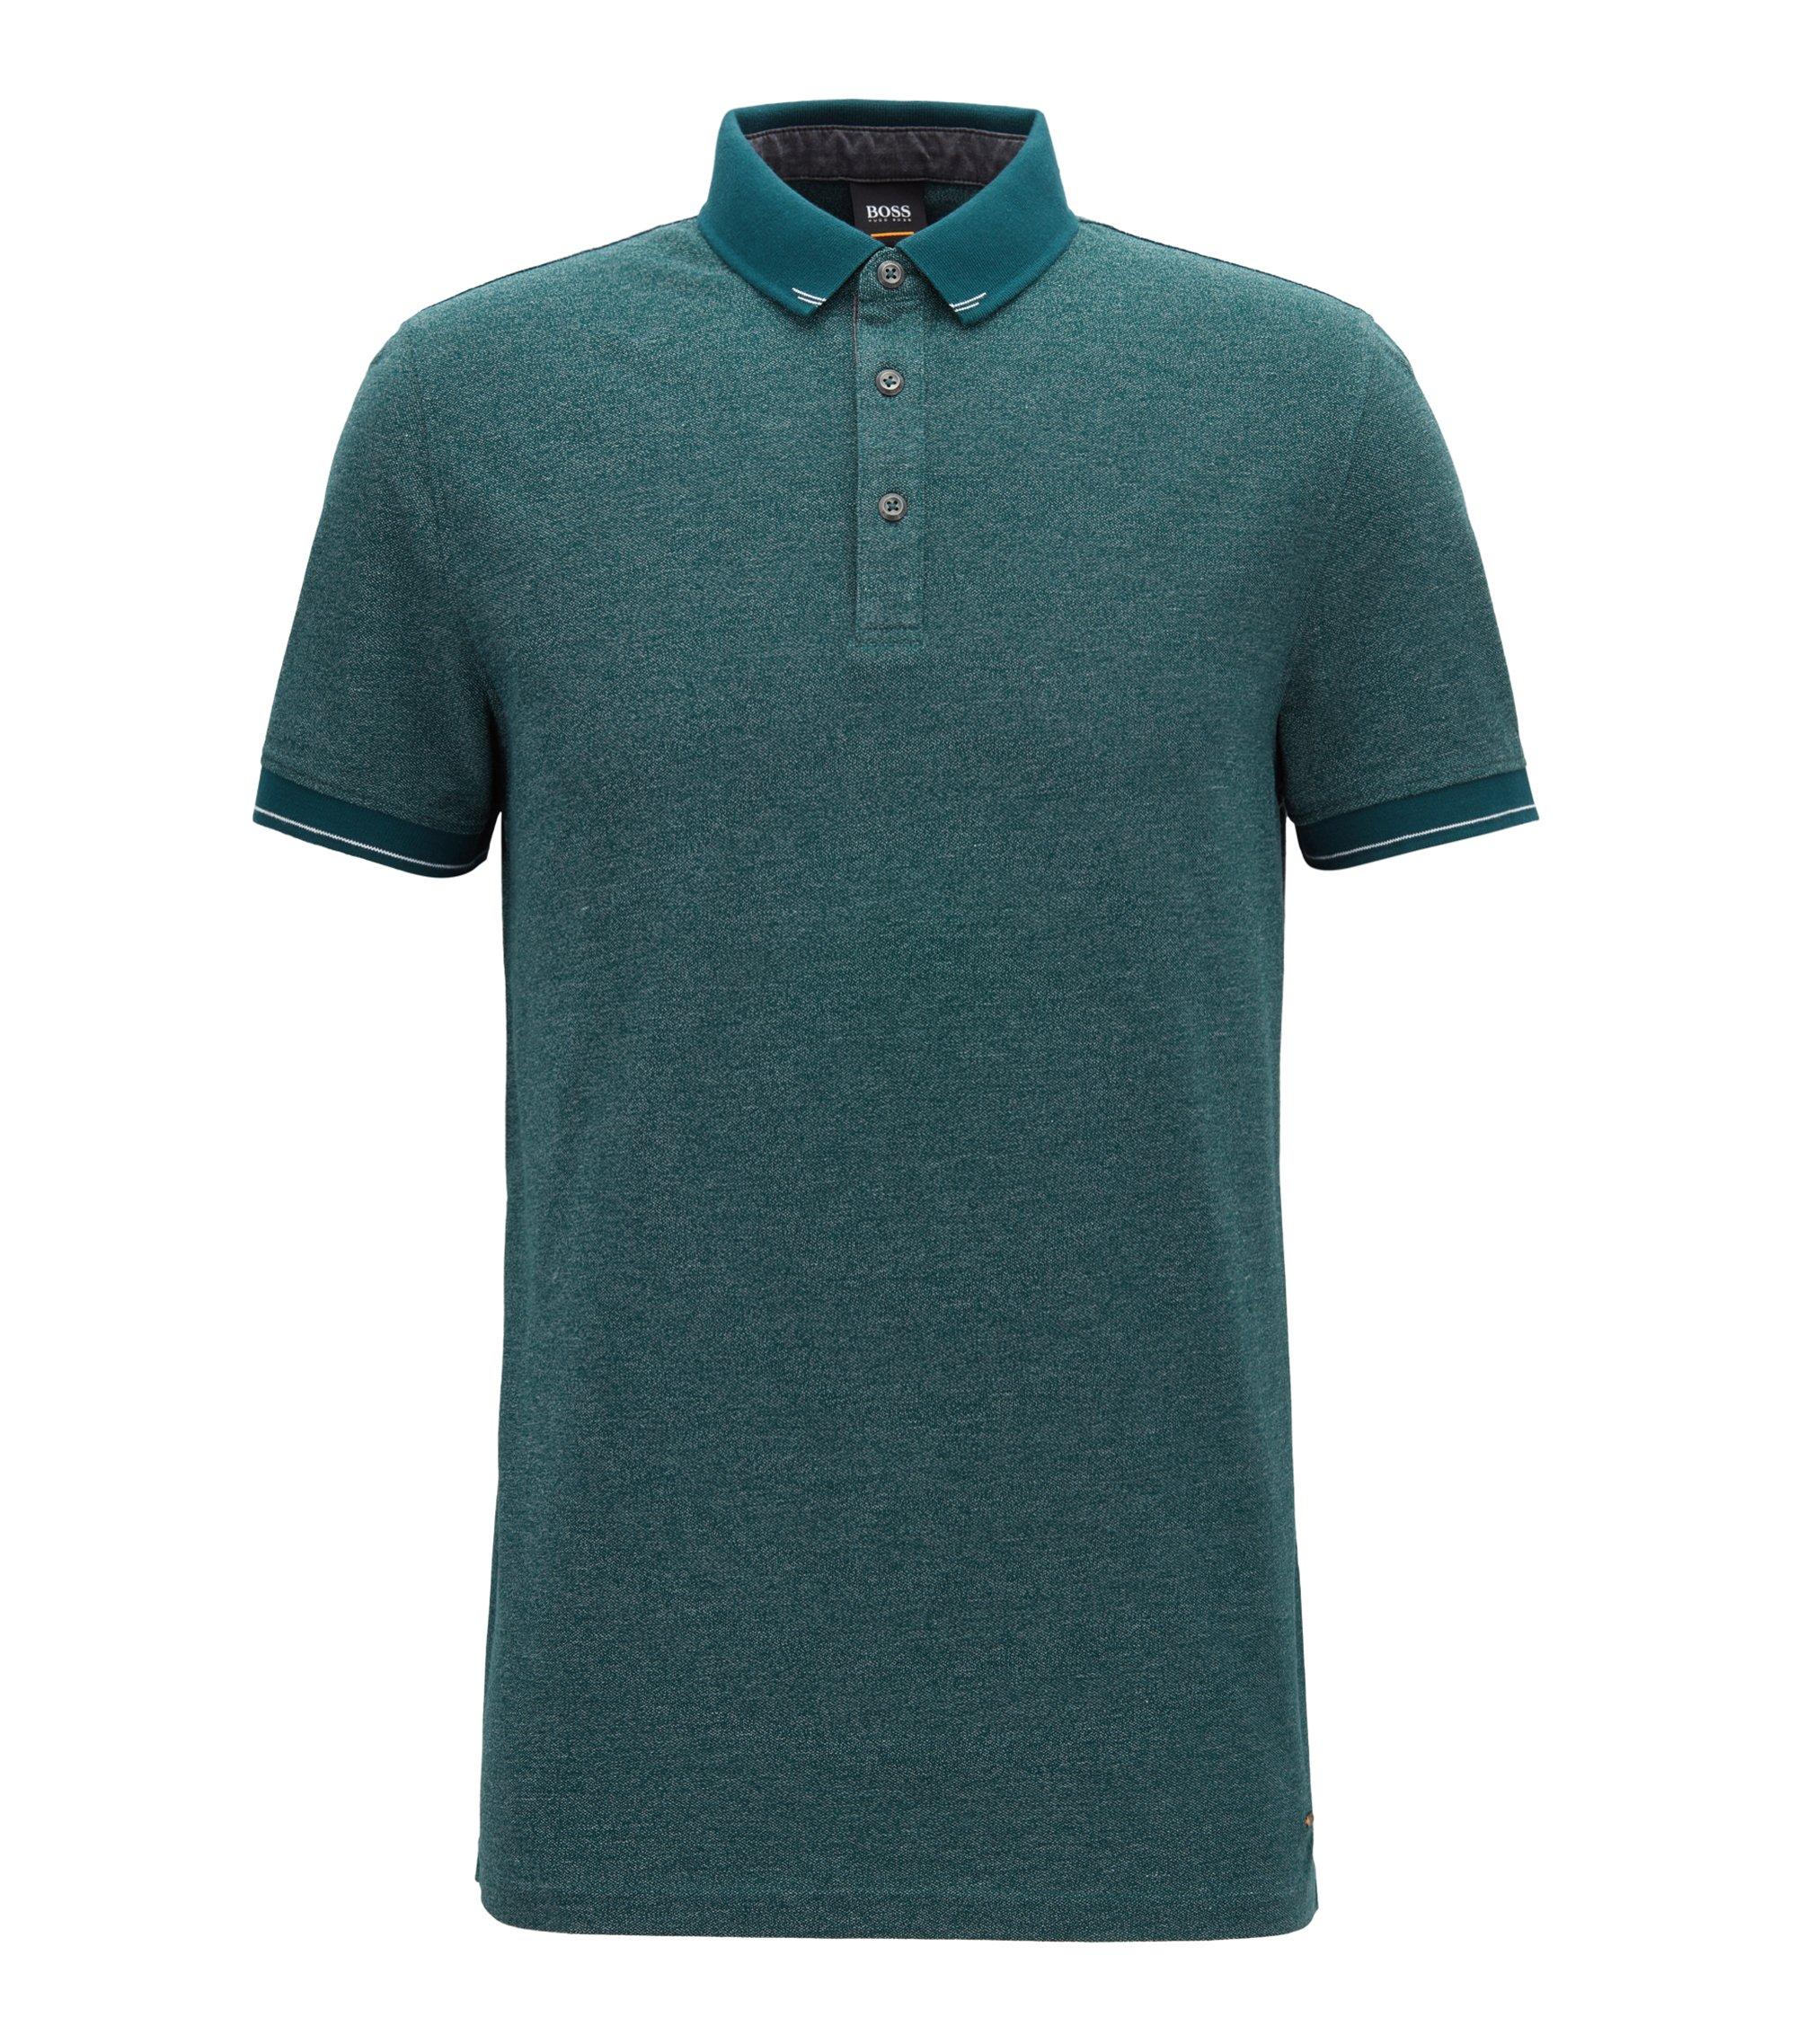 Poloshirt in Denim-Optik mit kontrastfarbenen Details, Dunkelgrün